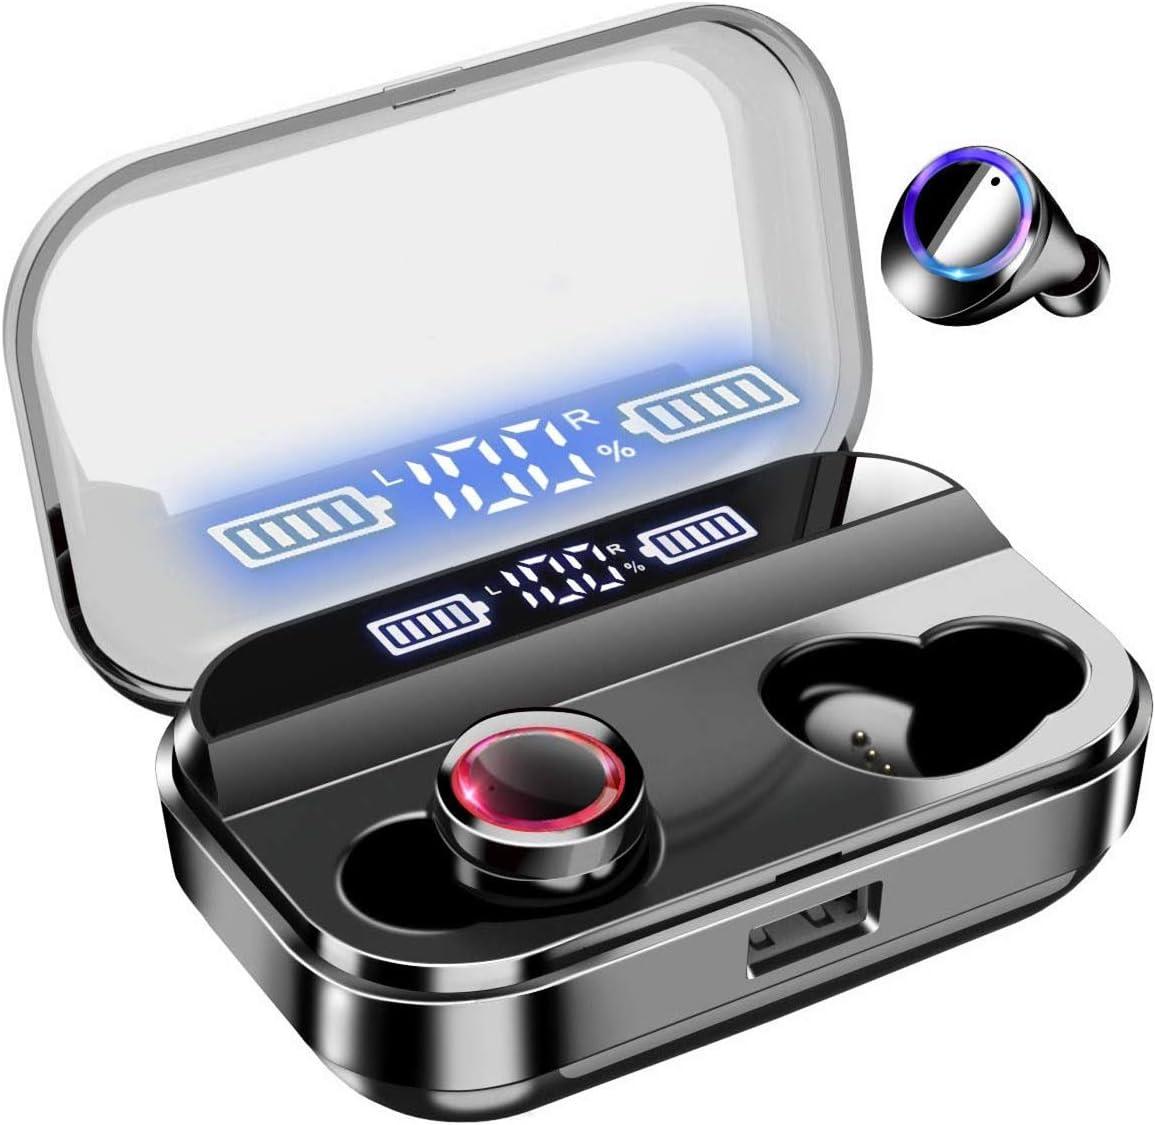 Bluetoothイヤホン 【NaruSky ワイヤレスイヤホン 】 Bluetooth 5.0+EDR 搭載CVC8.0 Hi-Fi ノイズキャンセリング 瞬間自動接続 ブルートゥース イヤホン 最大35時間連続使用 ハンズフリー通話 AAC&SBC対応 IPX7防水 Siri対応 Type‐C充電 小型/軽量 (ブラック); セール価格: ¥3,499